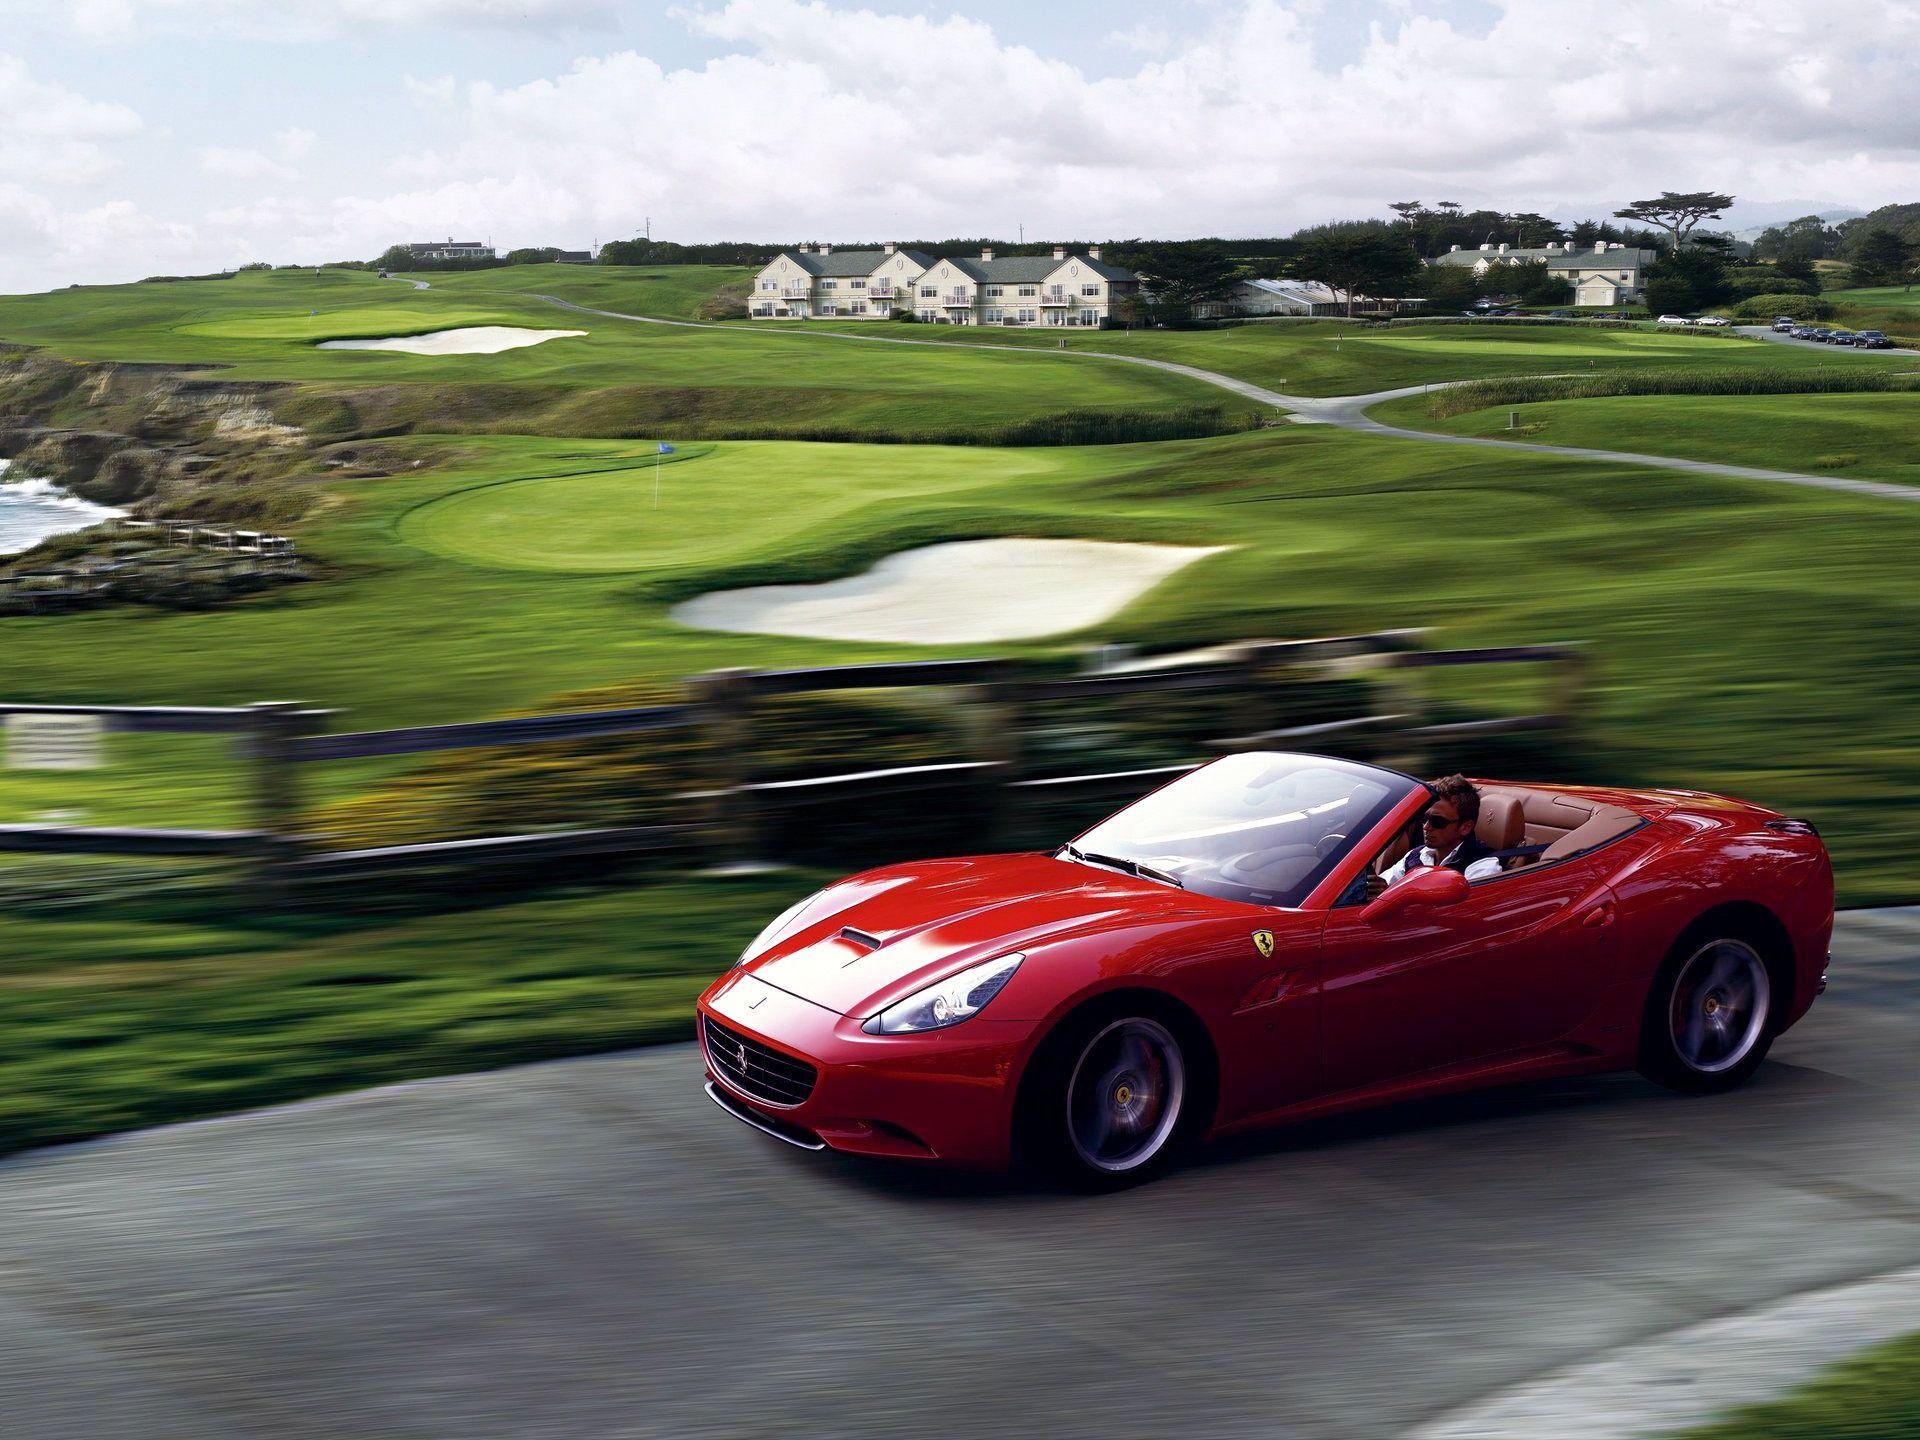 Lovely #ferrari #california | Ferrari california, Ferrari ...